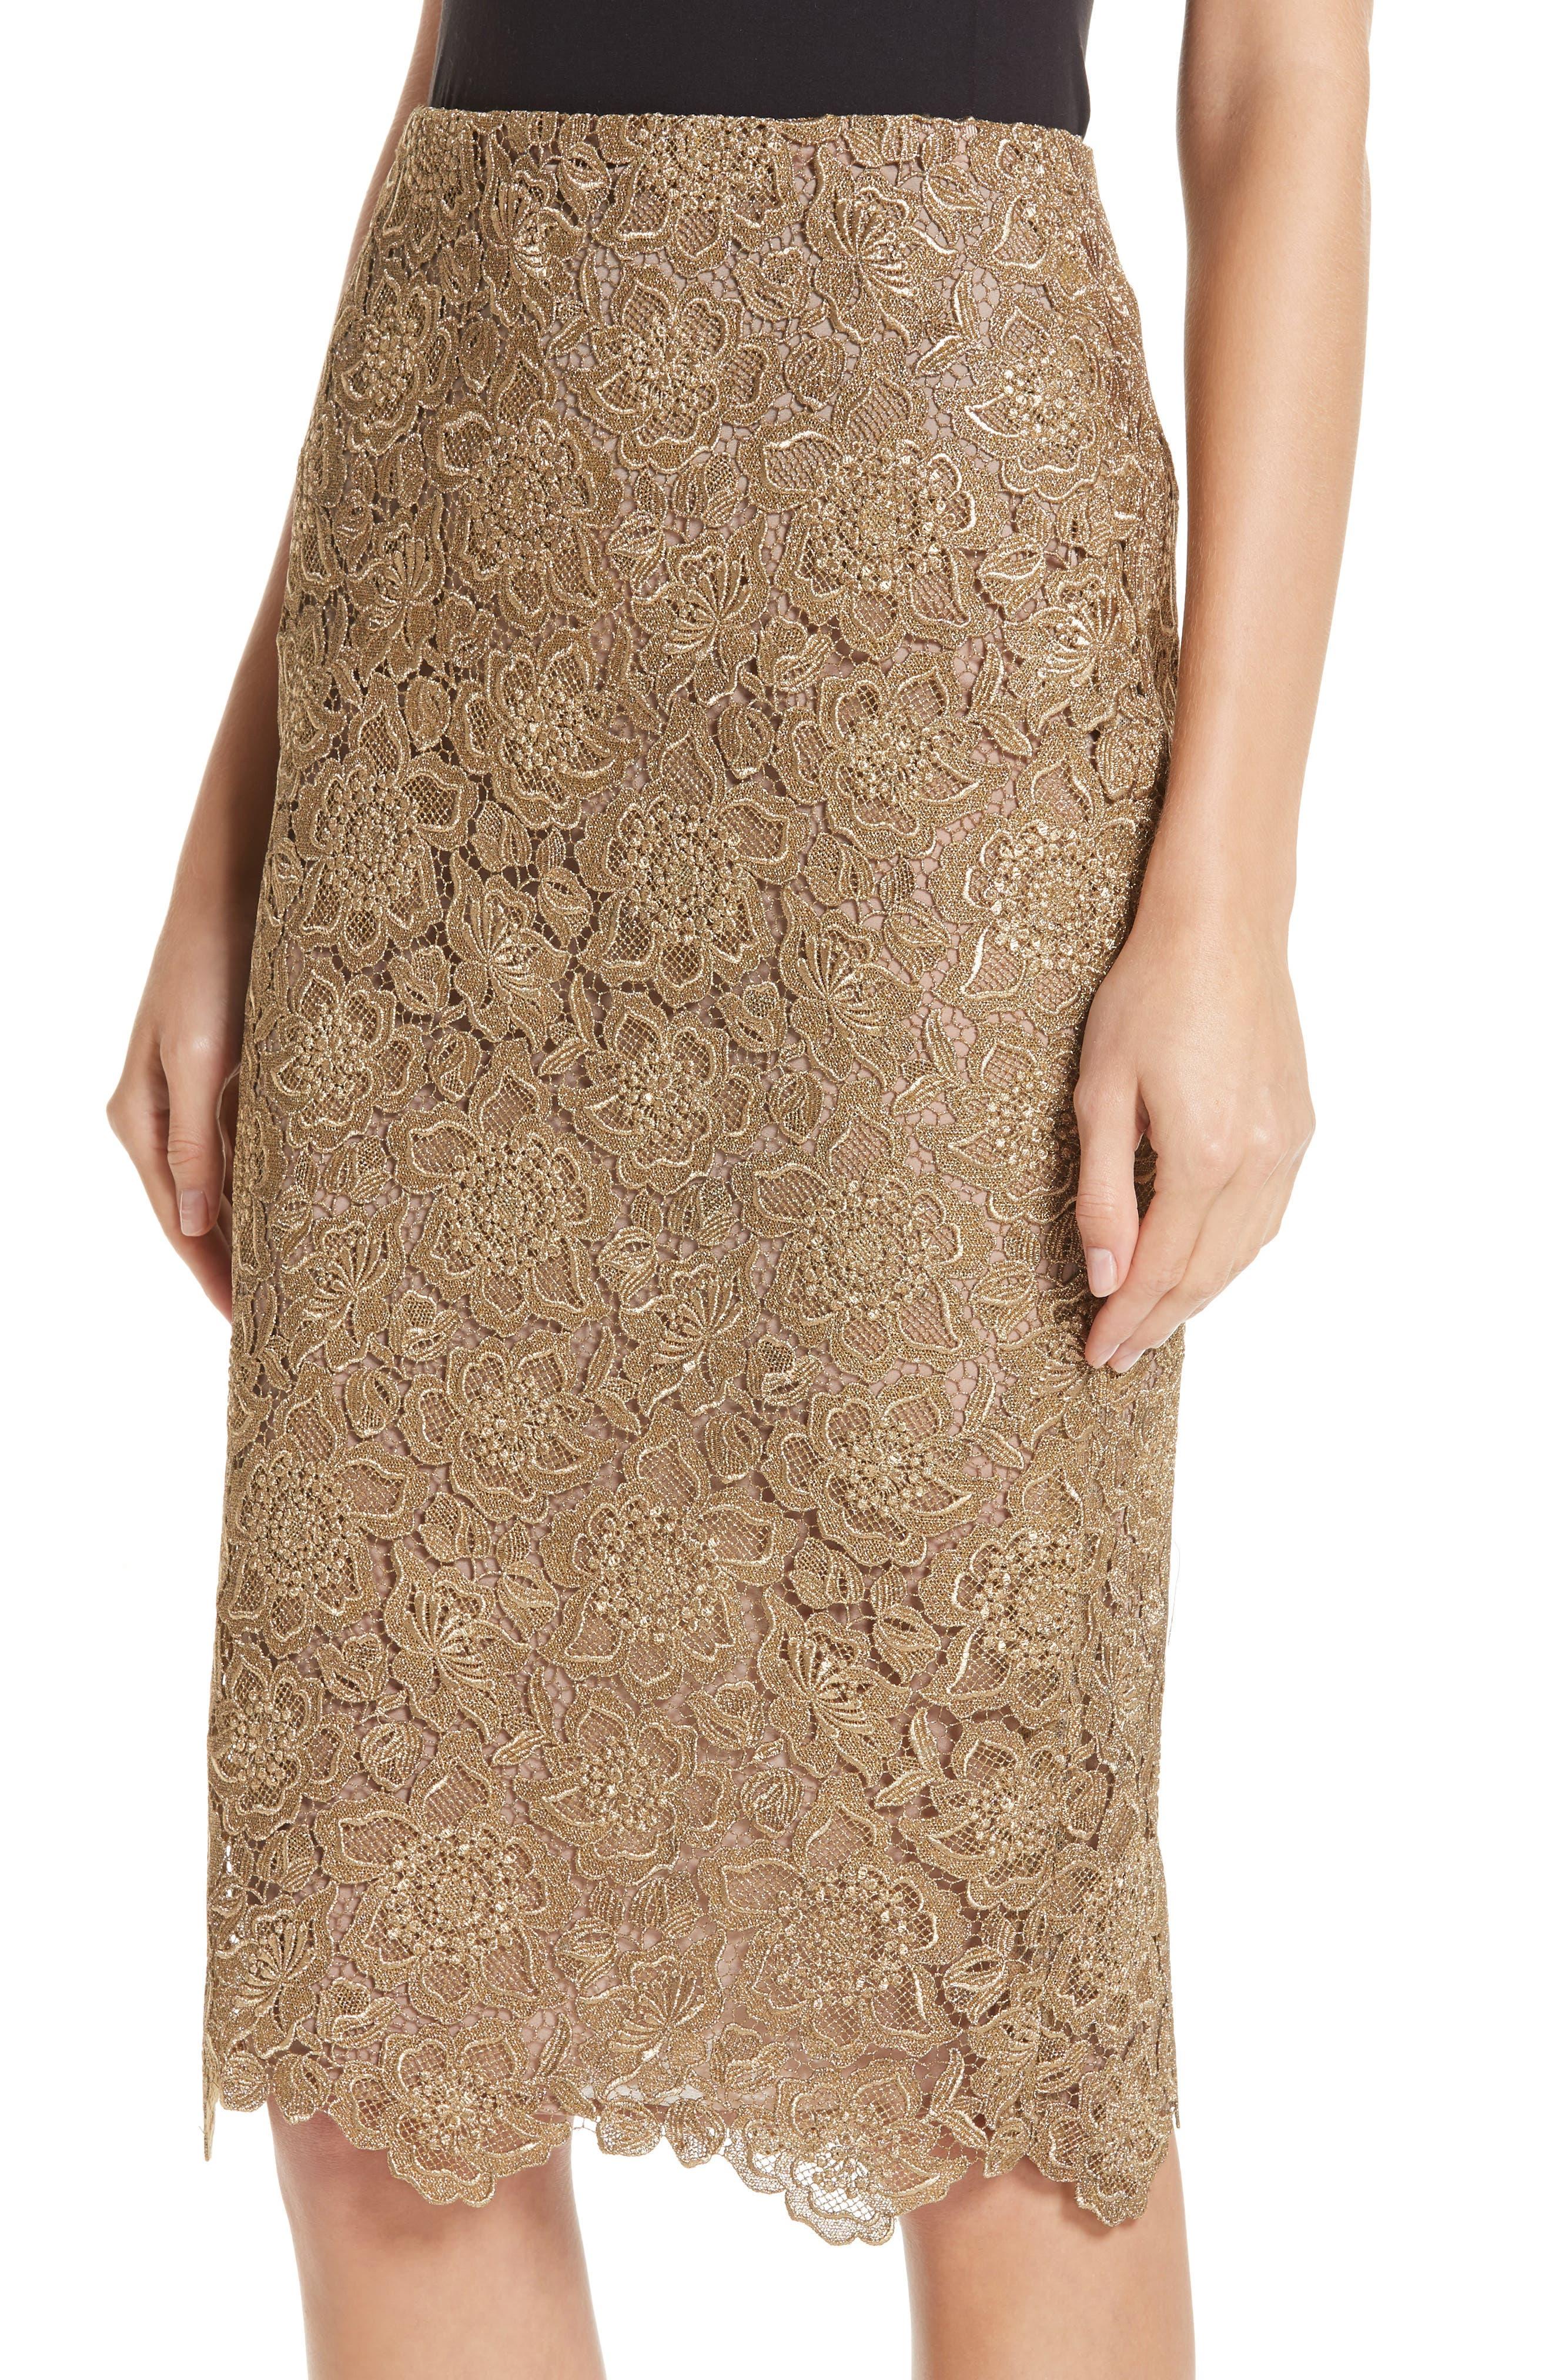 Anemone Guipure Lace Pencil Skirt,                             Alternate thumbnail 4, color,                             GOLD